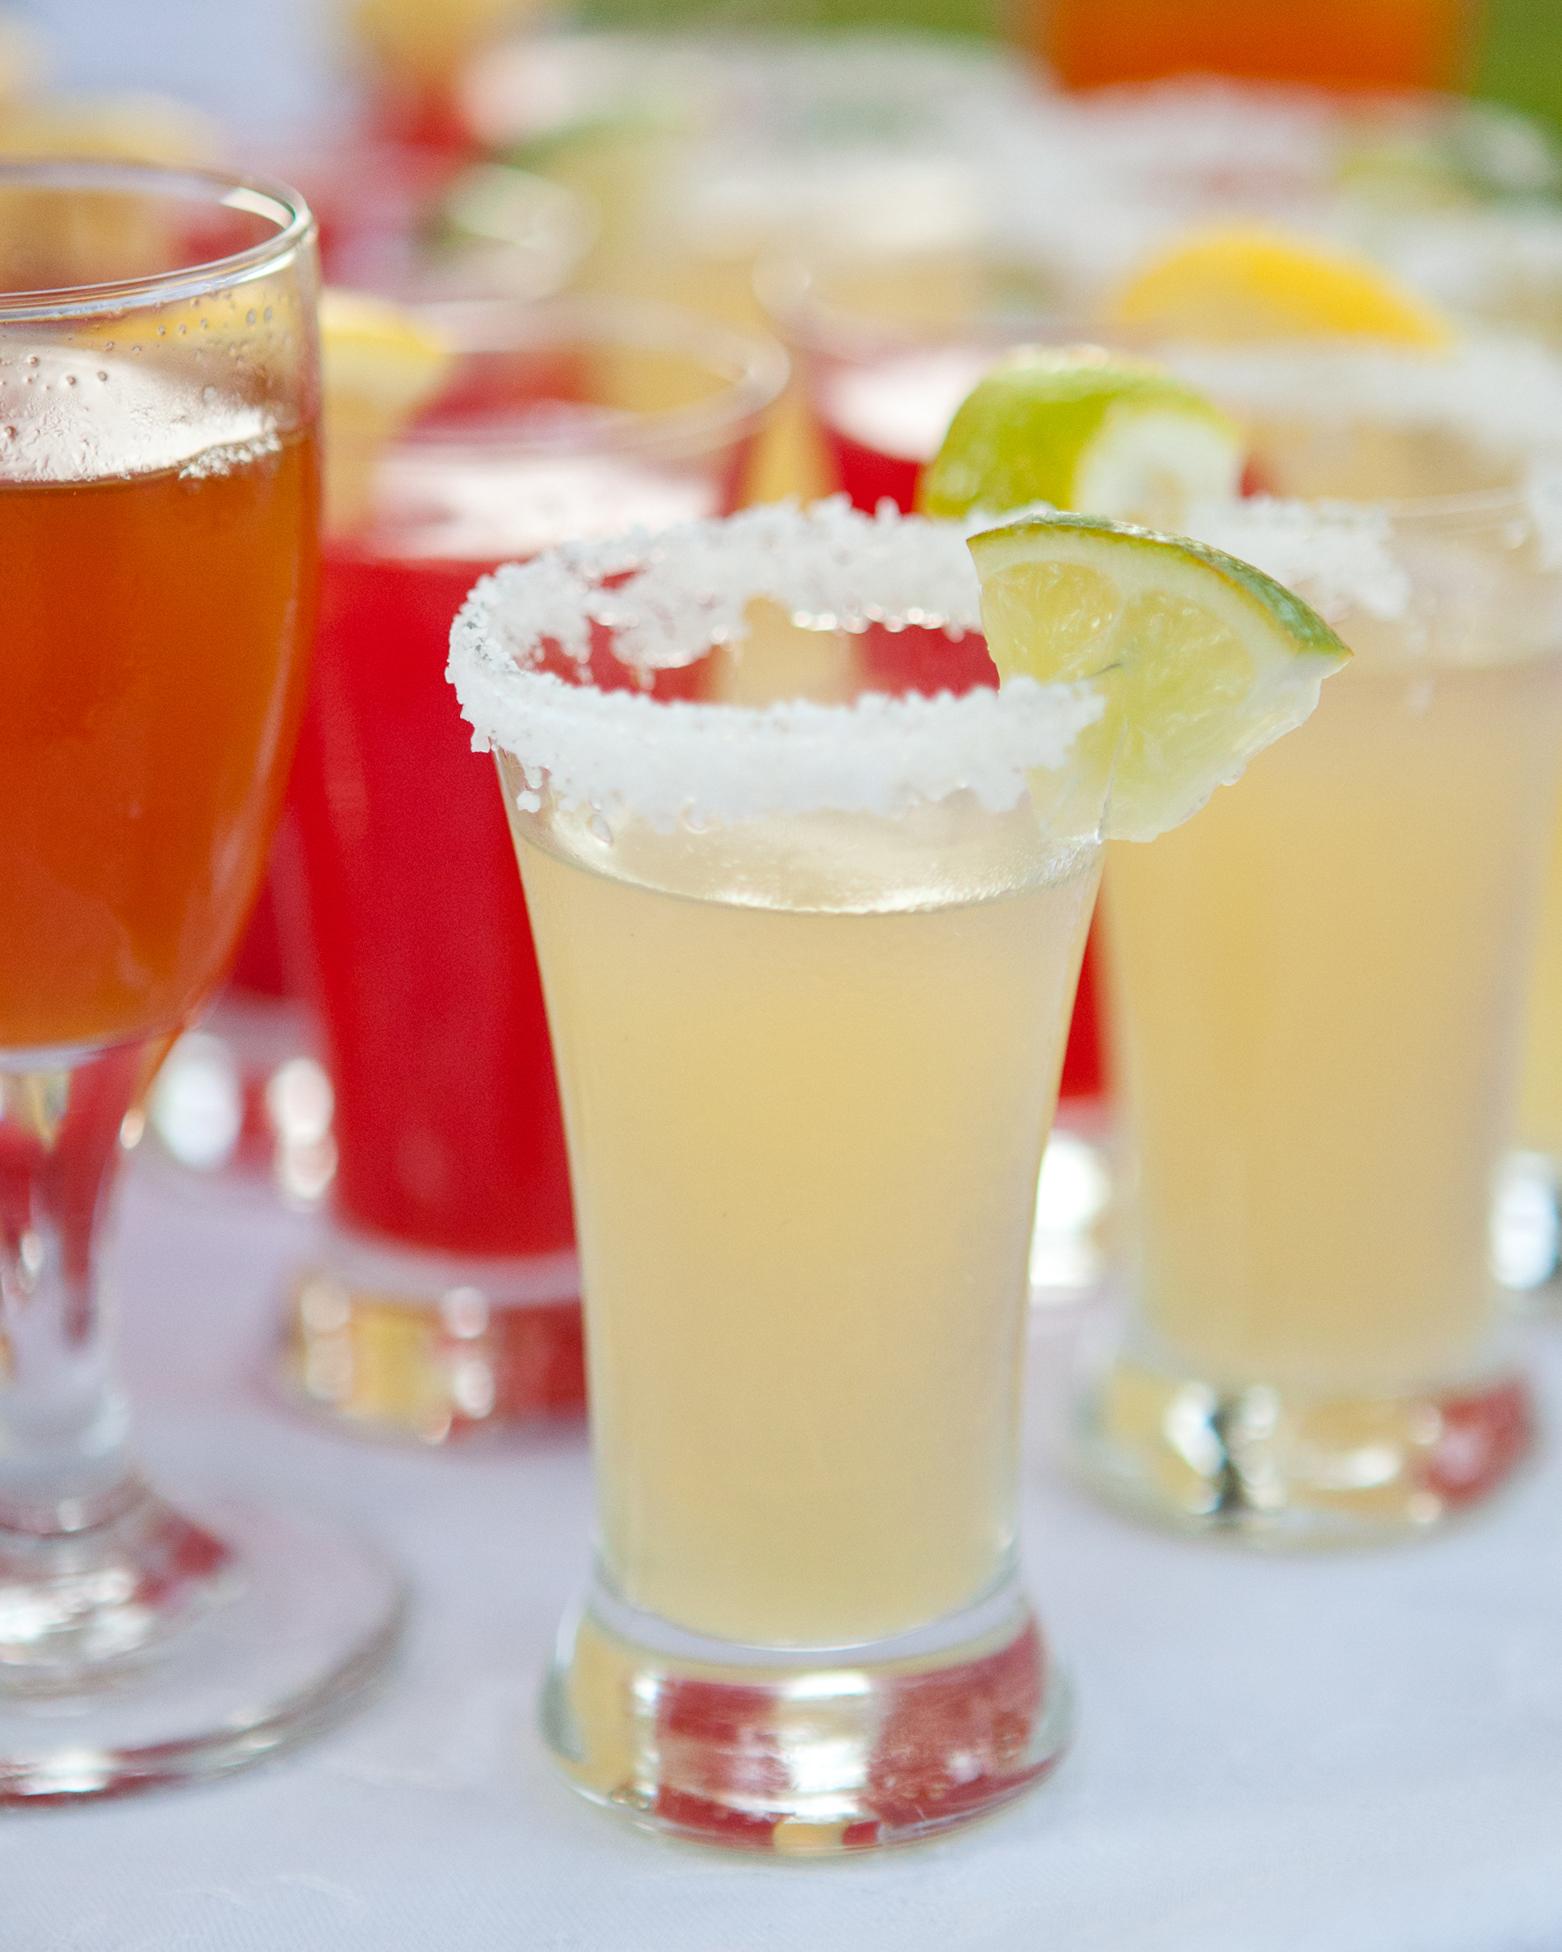 allison-tyler-drinks-1452-wds110384.jpg